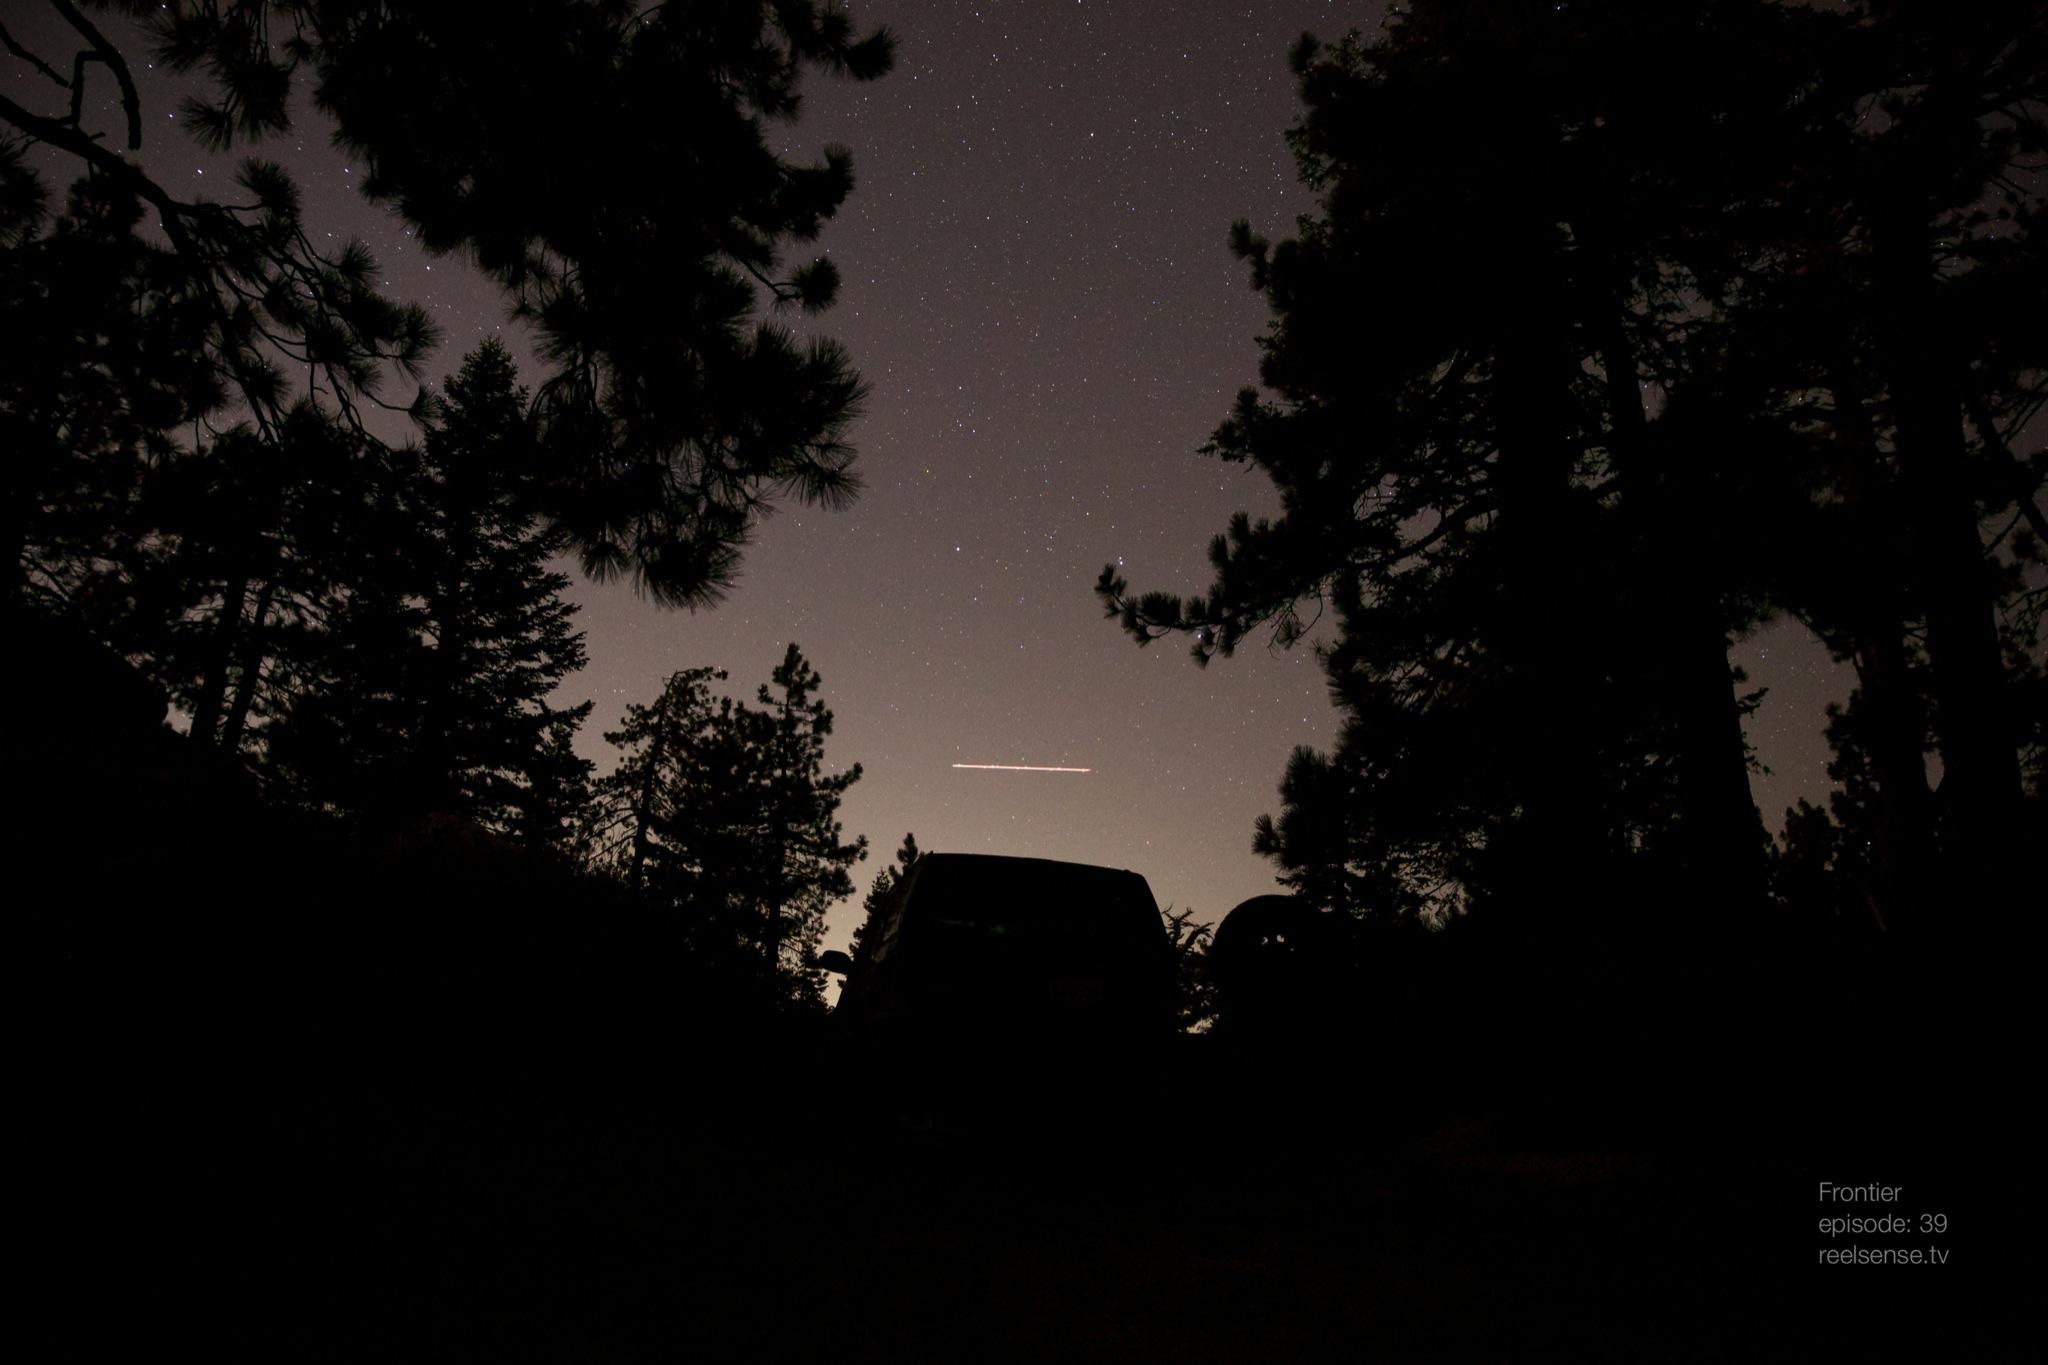 Big Bear, CA - Silhouette of Jeep